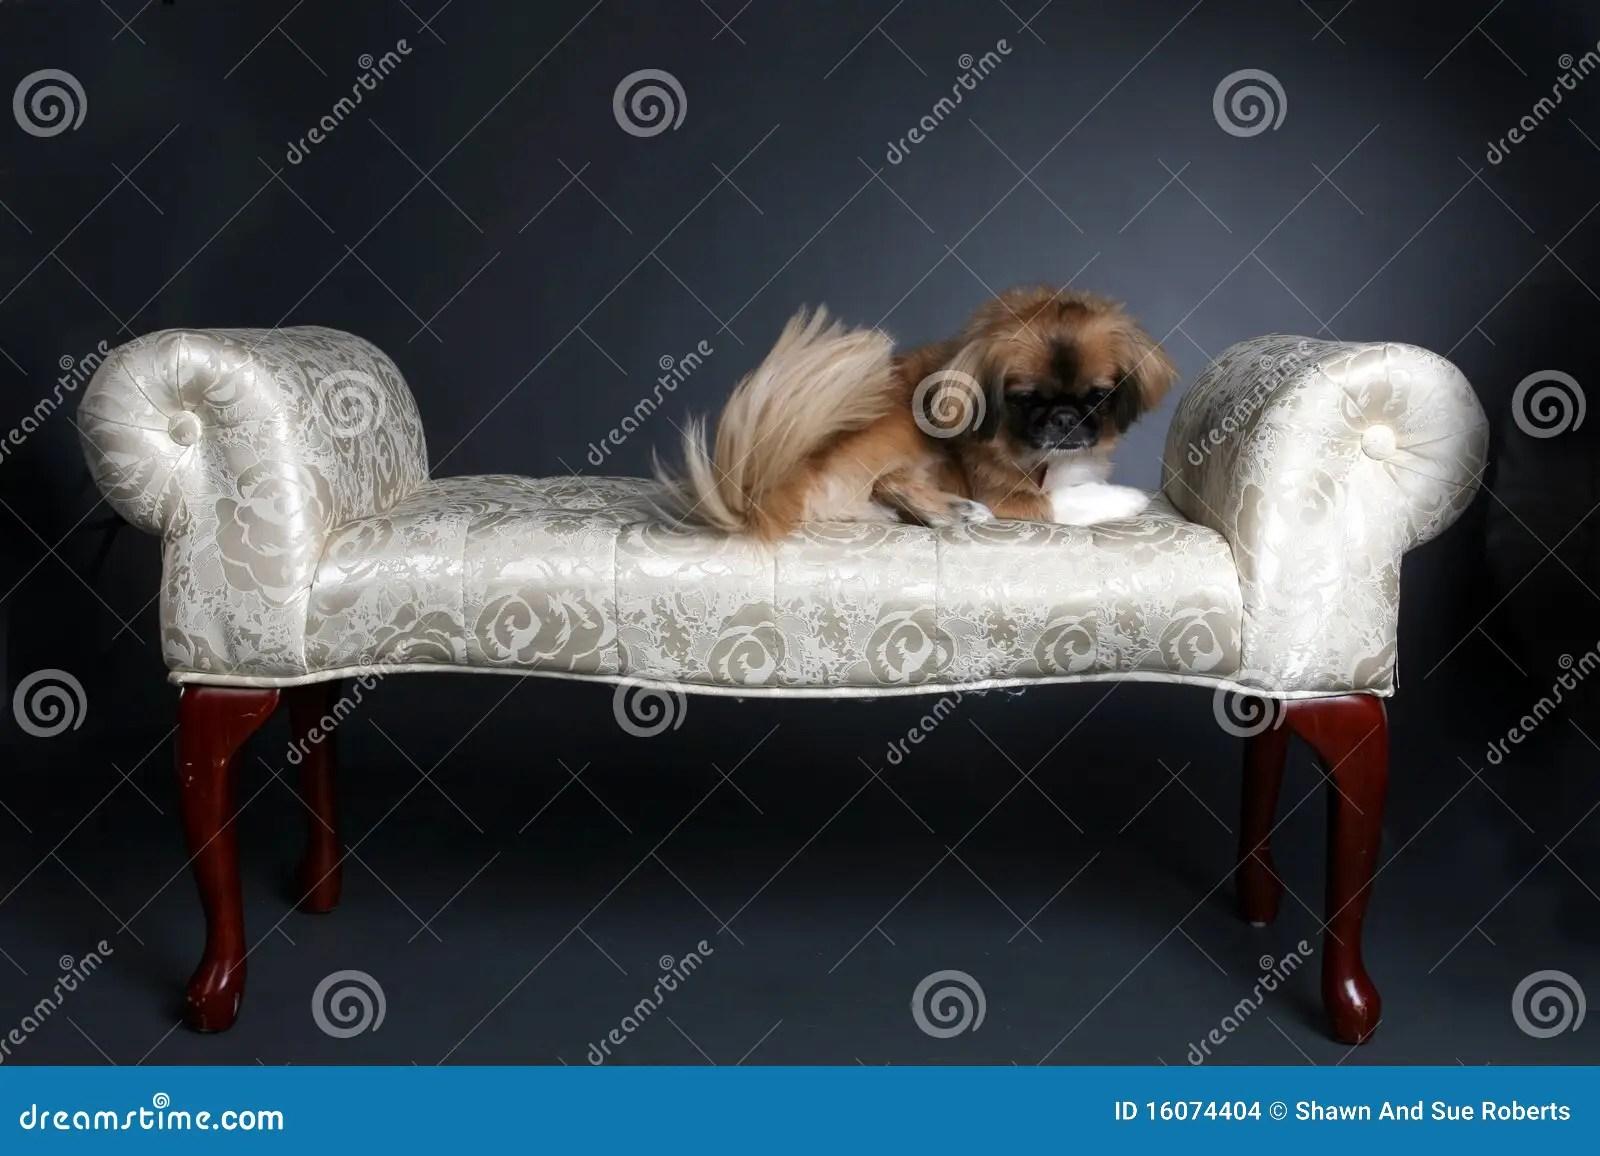 Small Lap Dog Sitting On Bench Stock Images Image 16074404